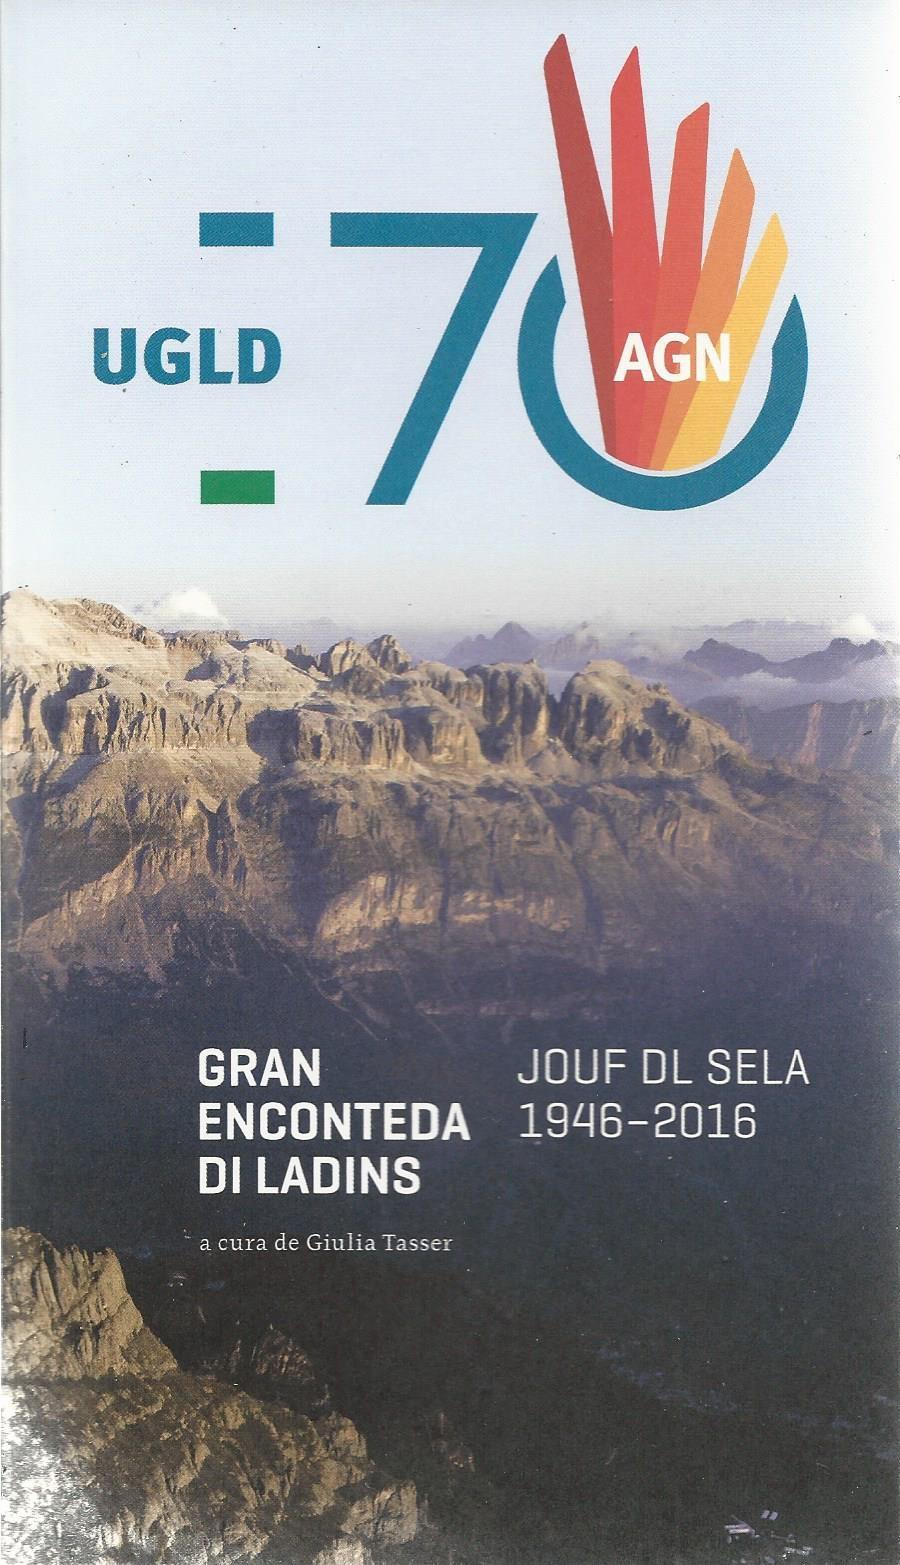 UGLD 70 ani Gran enconteda di Ladins 1946-2016, Giulia Tasser